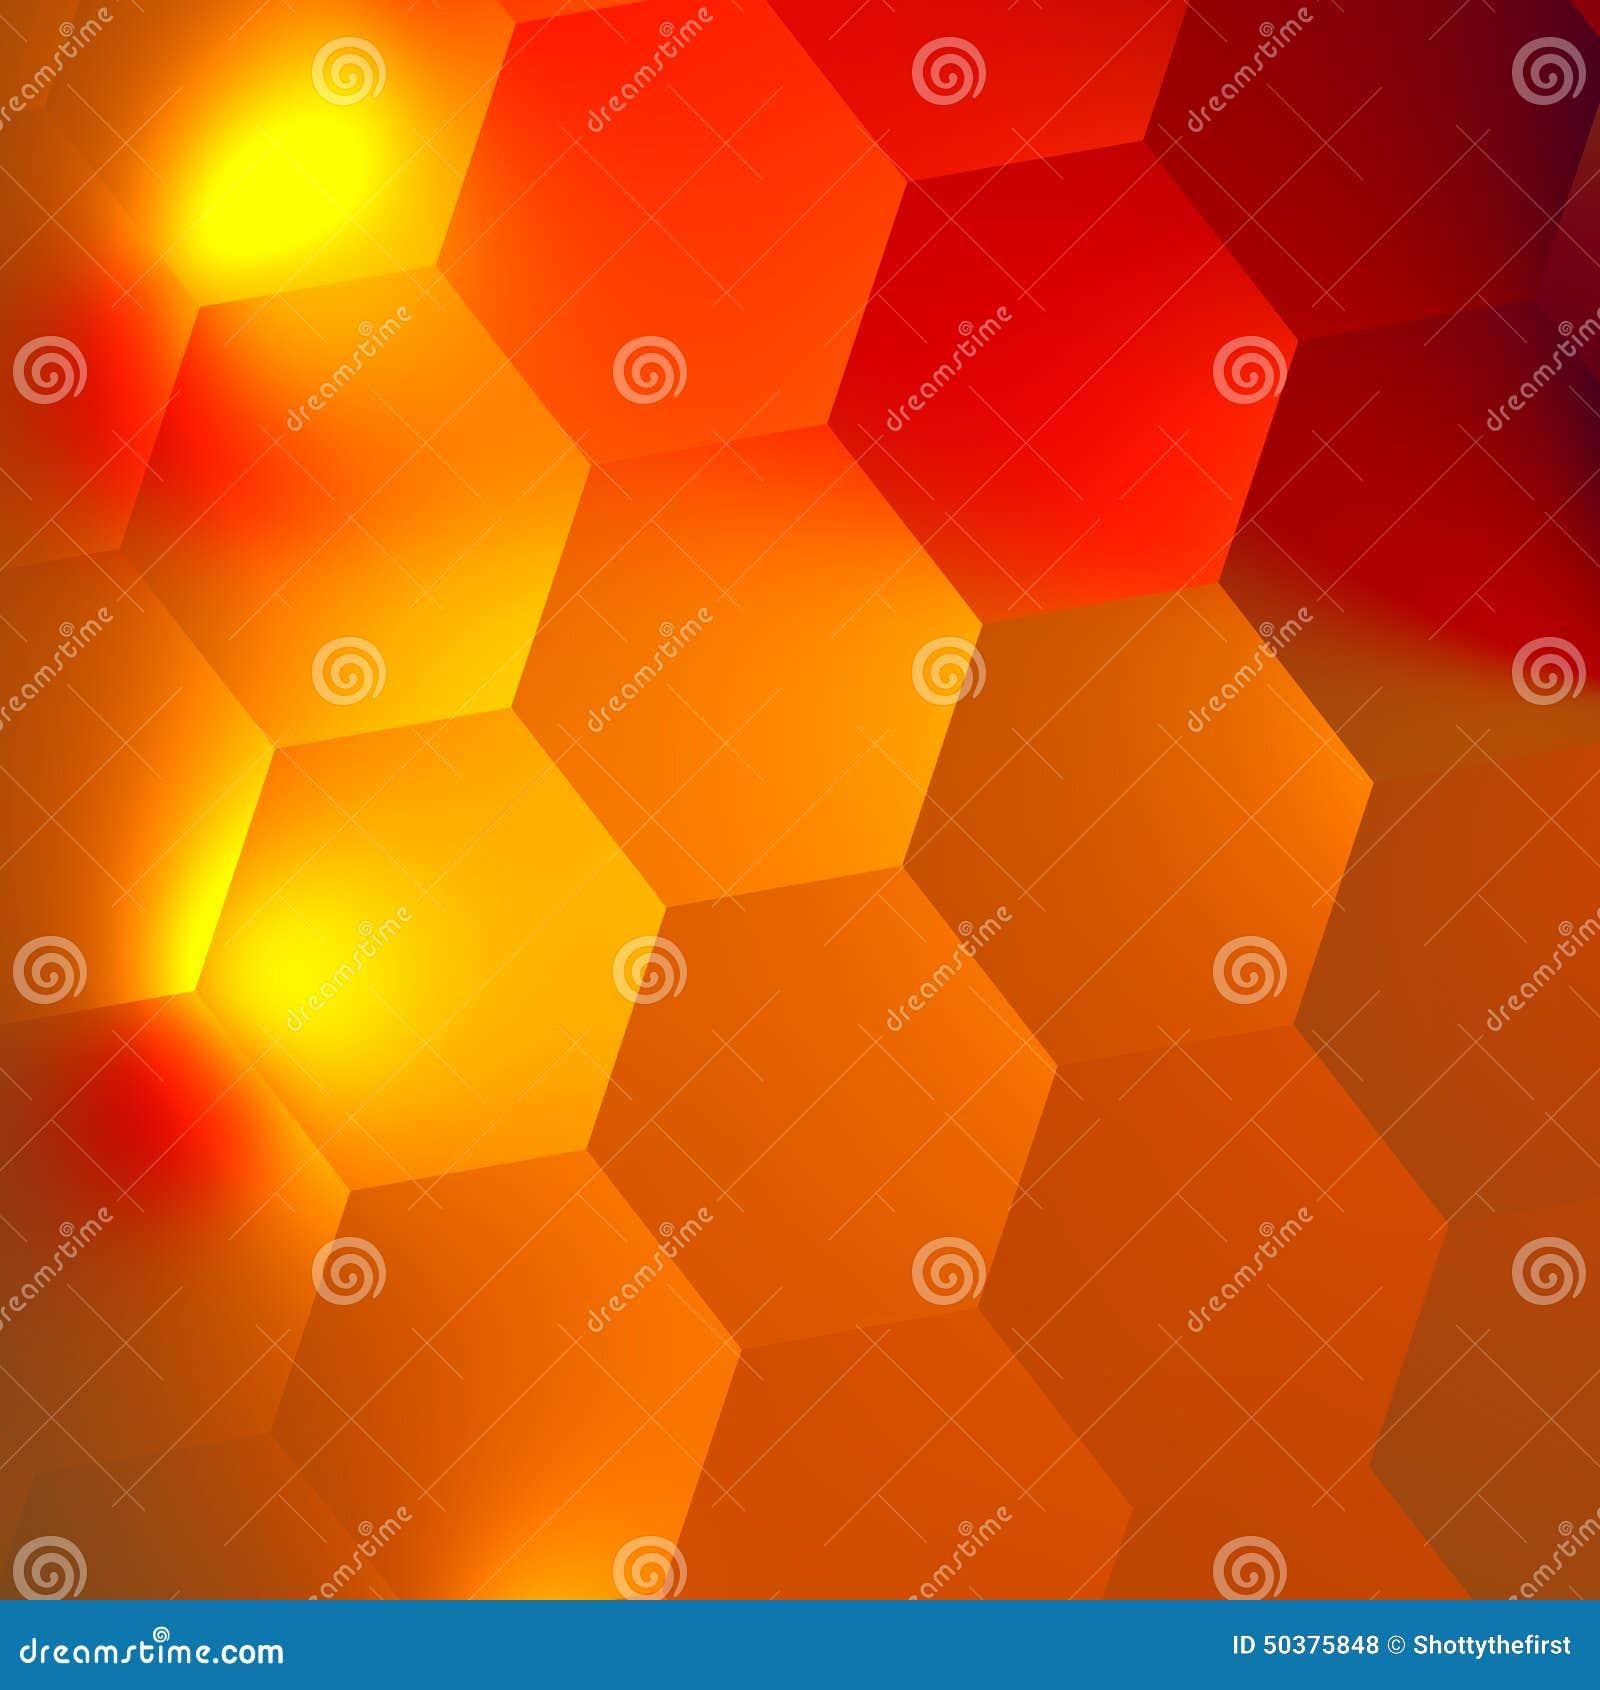 Orange Red Abstract Hexagons Background. Bright Light Effect in Dark. Honeycomb Backdrop. Minimal Style Digital Design. Flat.